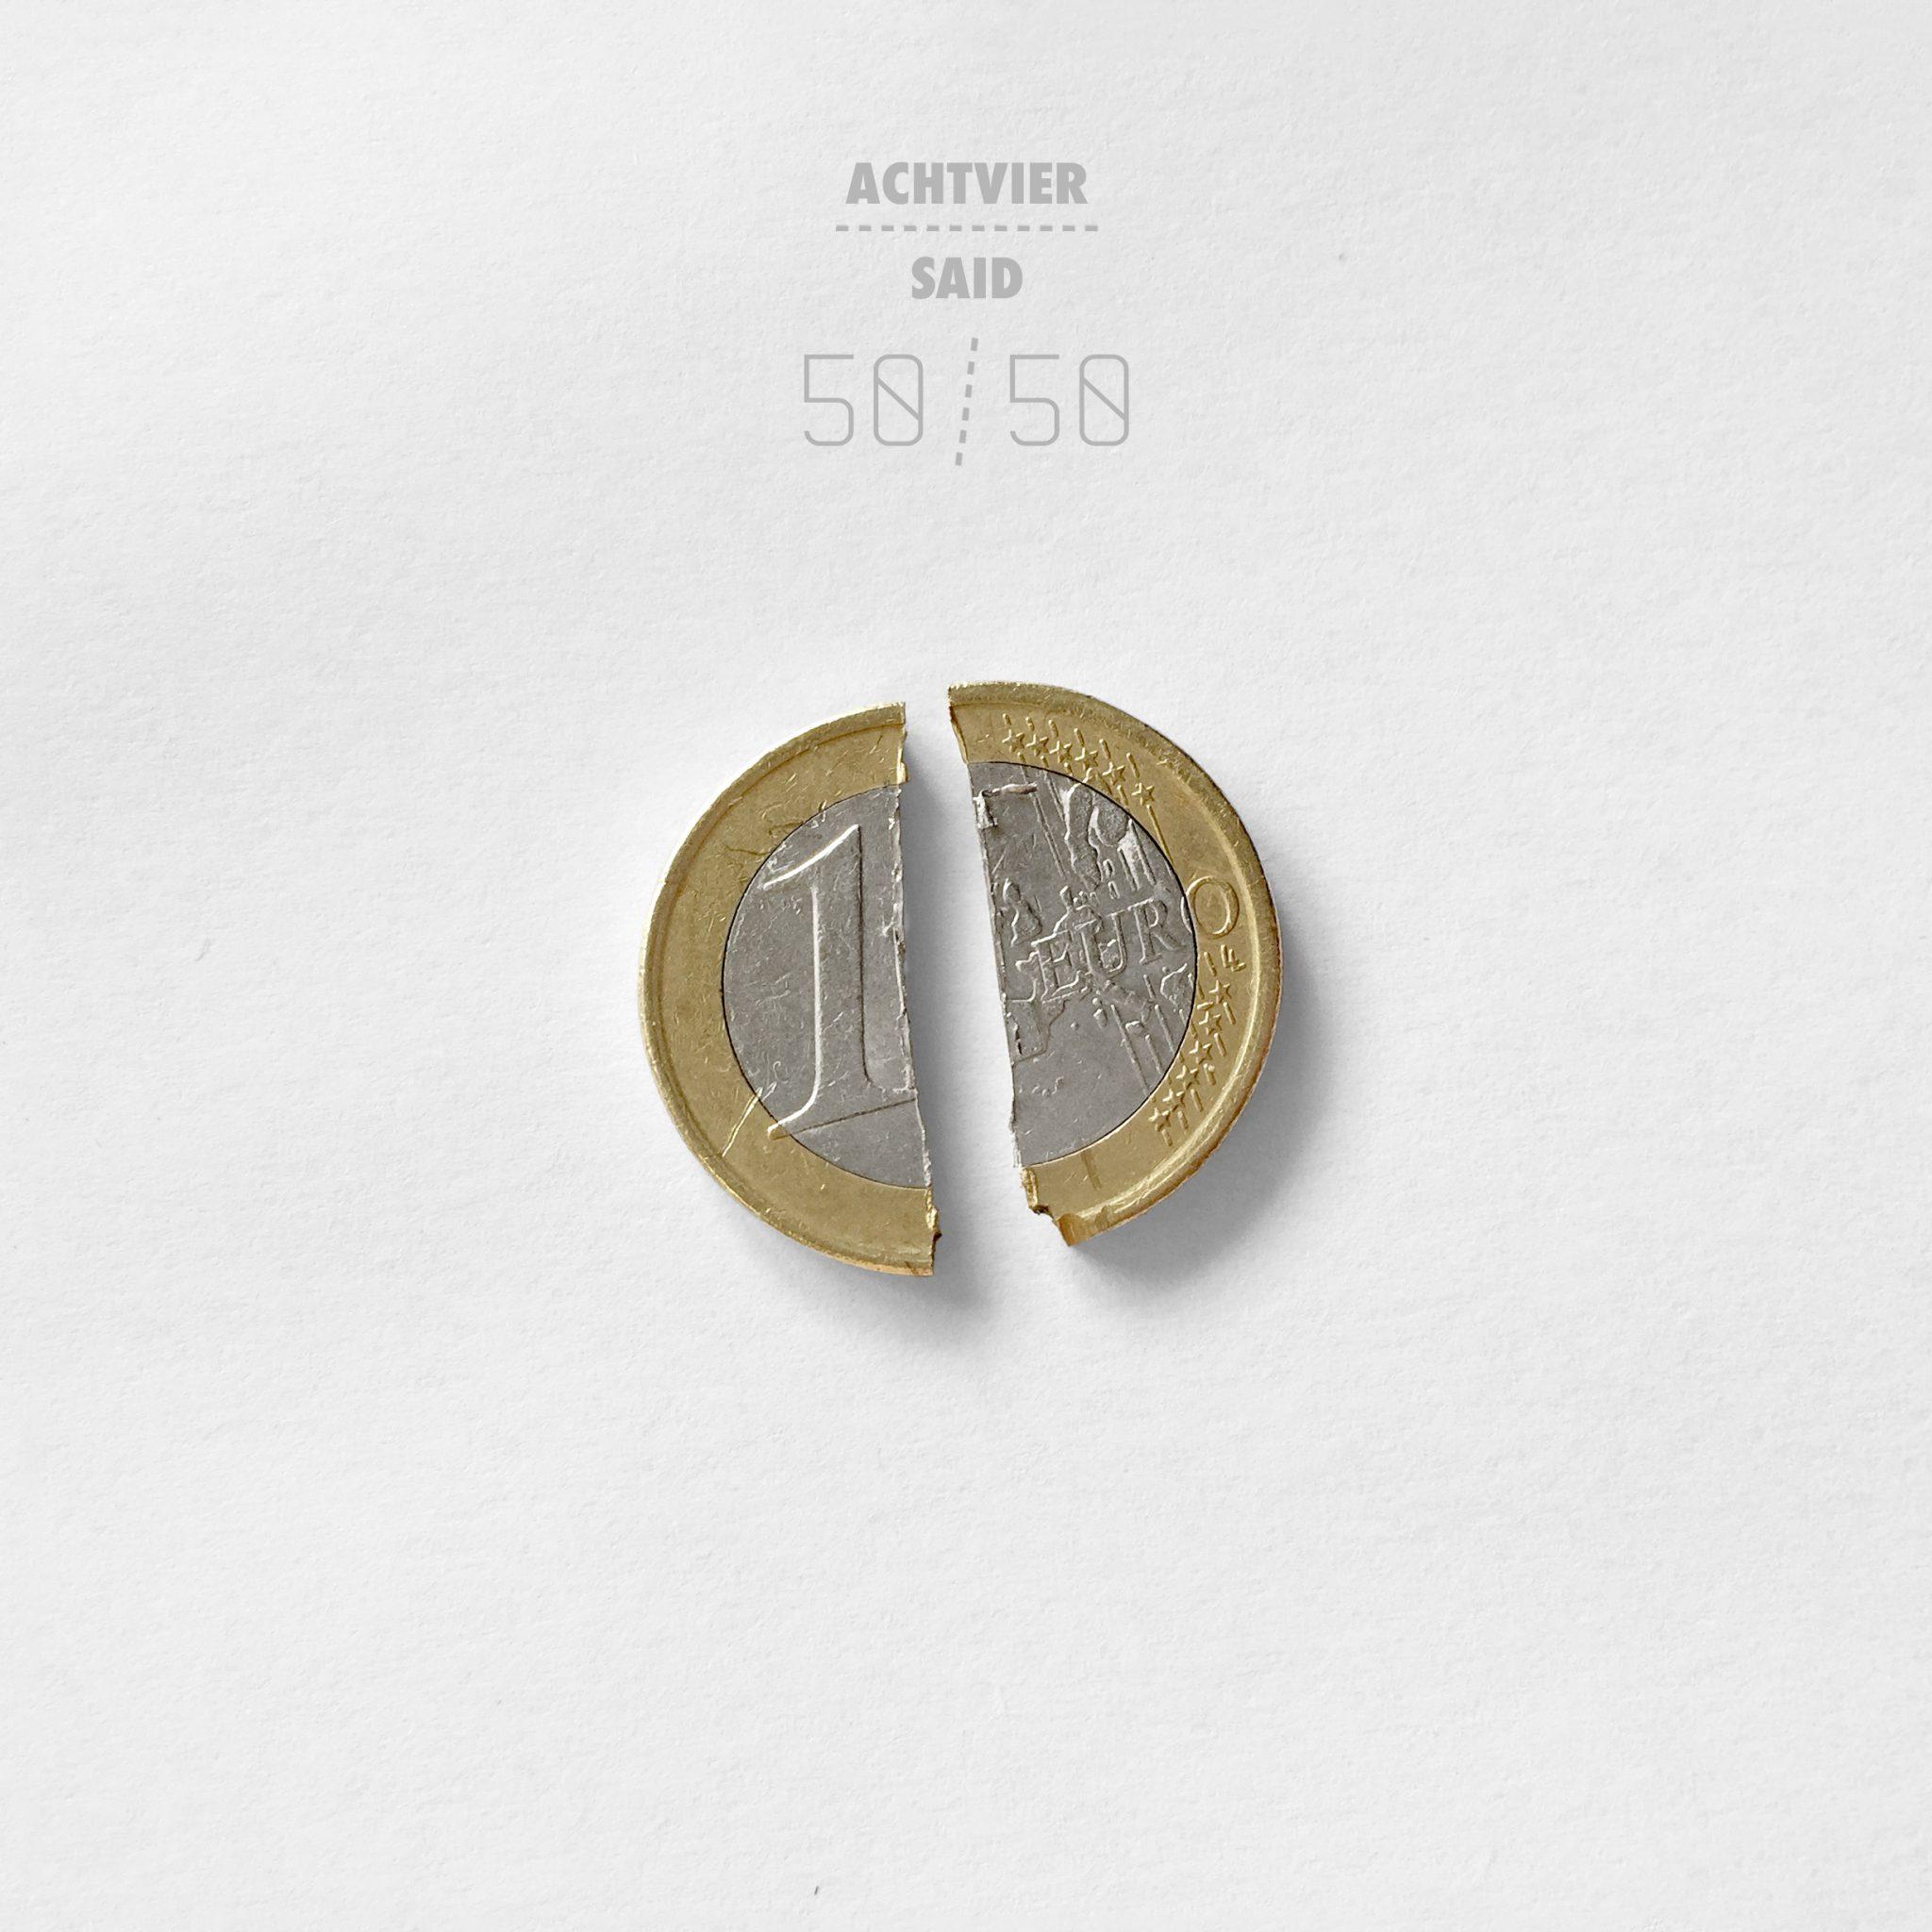 5050 Said AchtVier